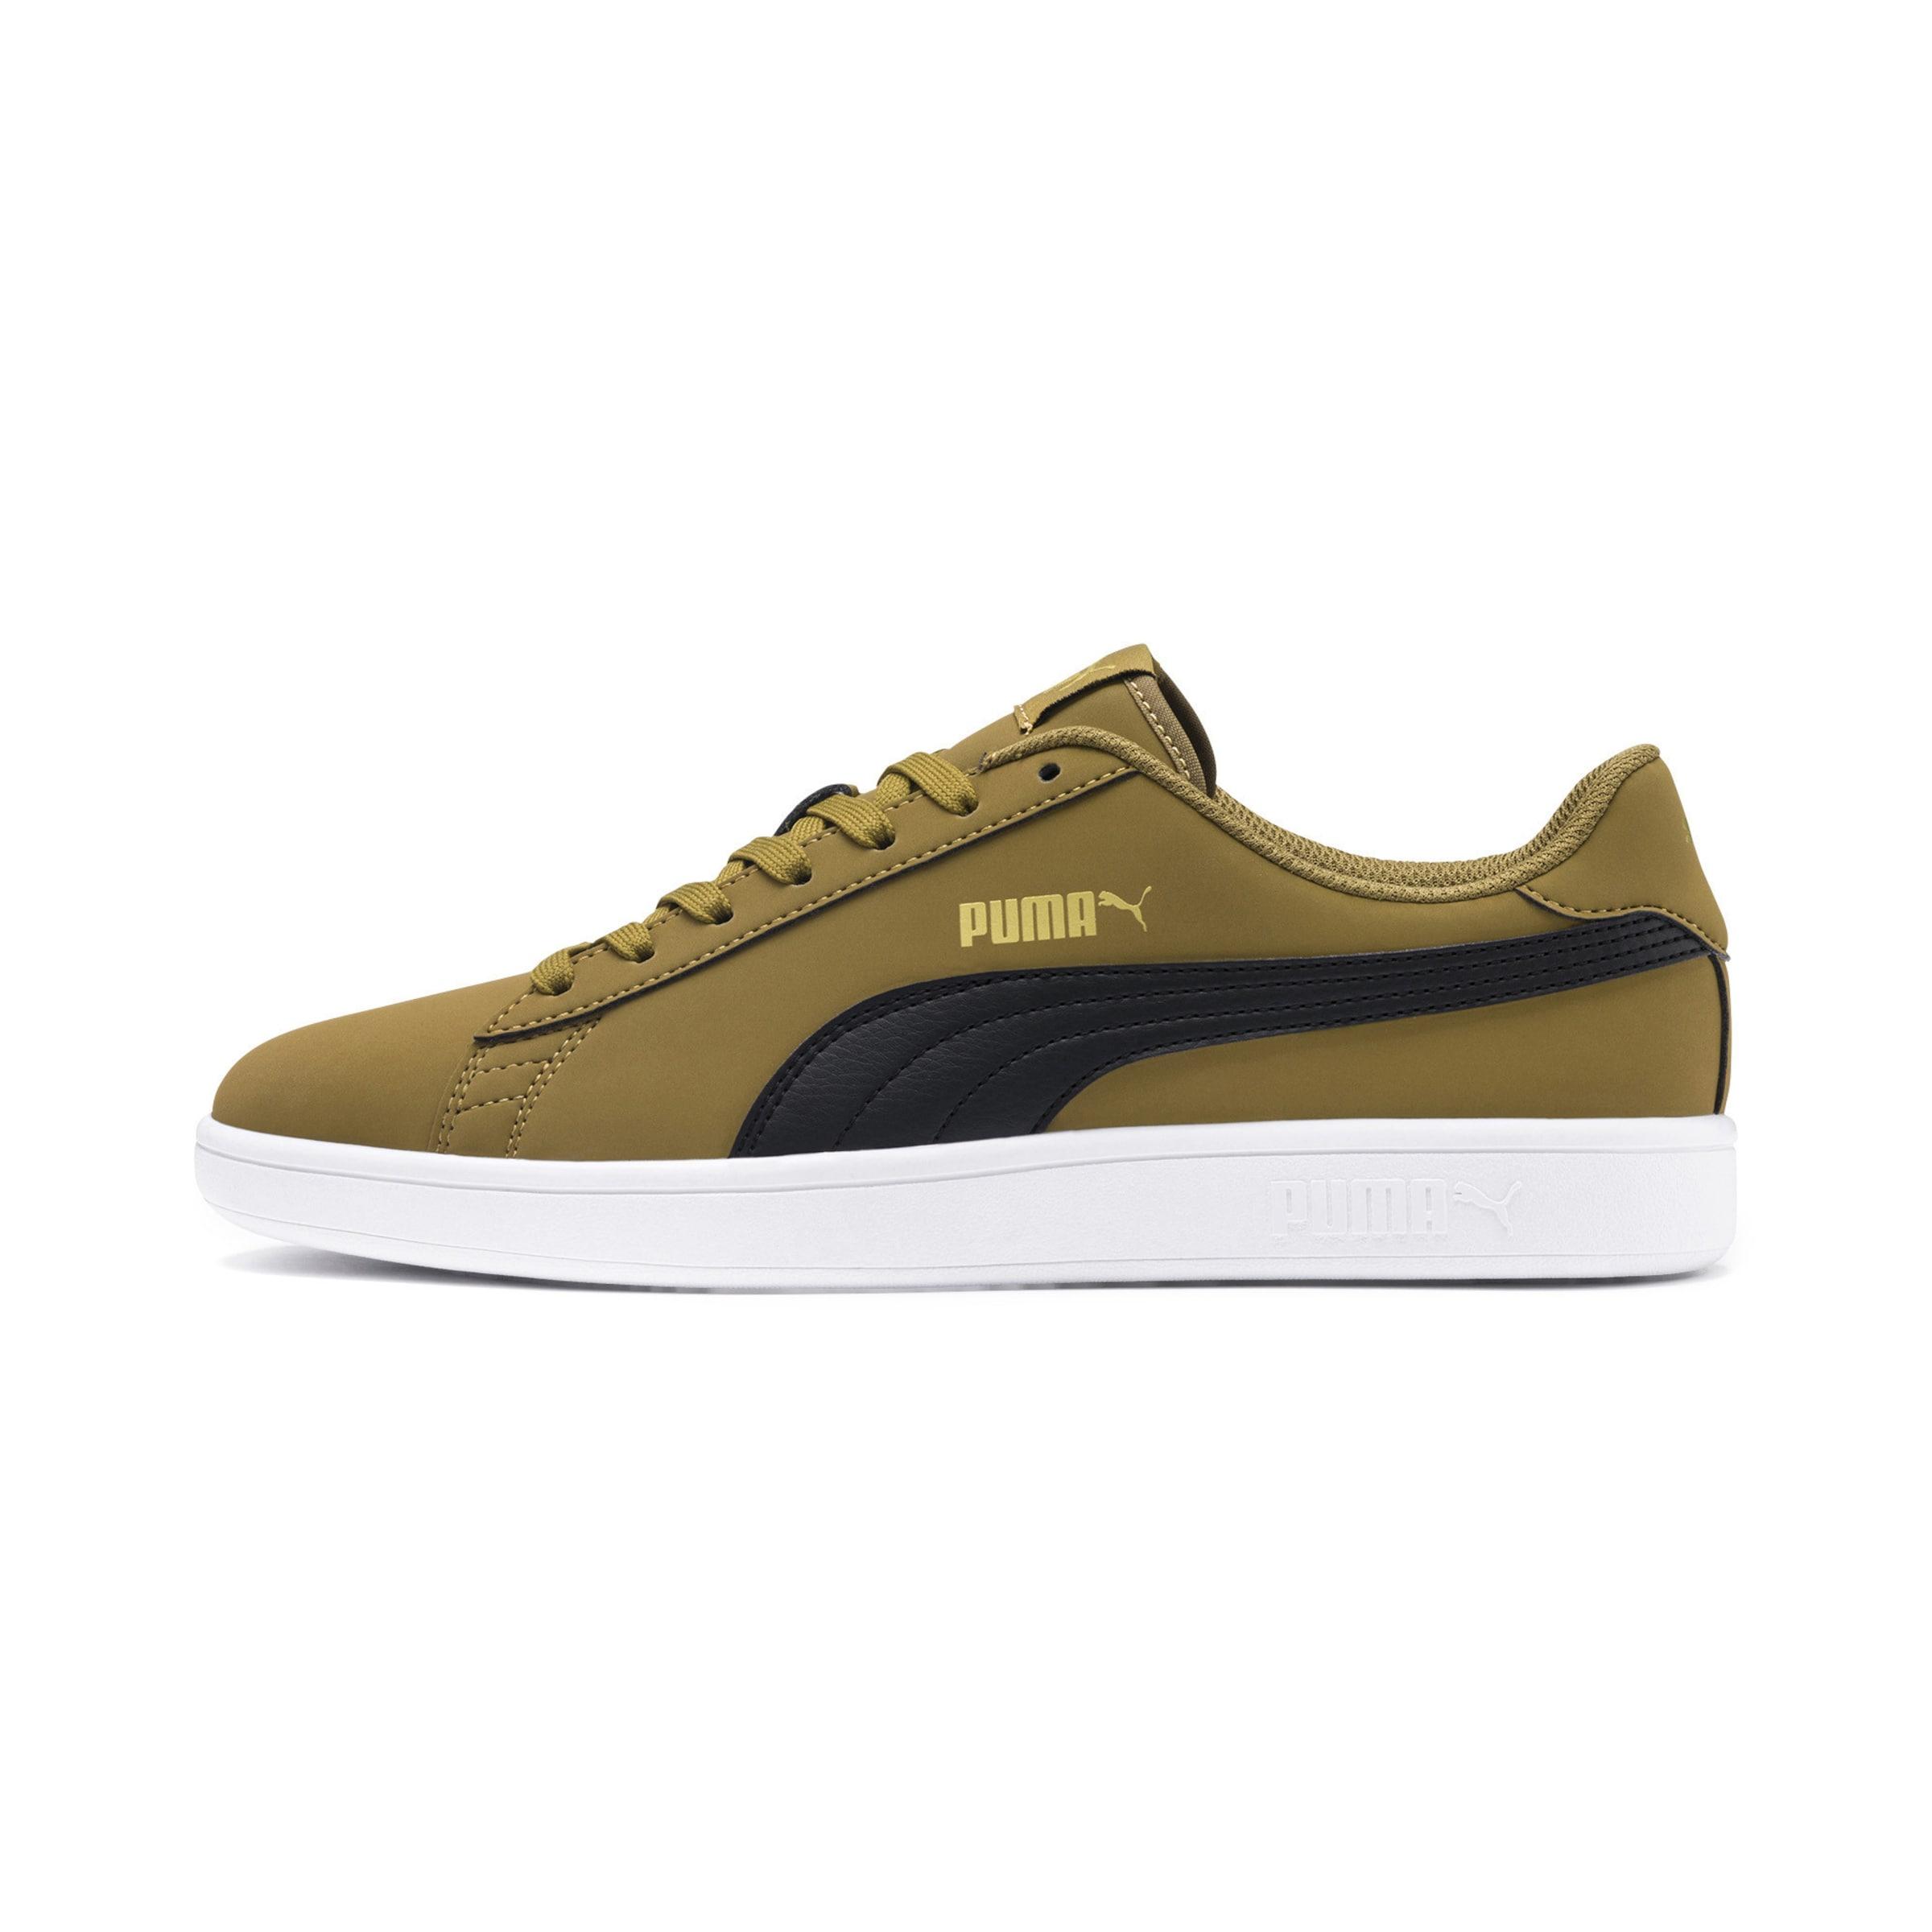 Puma V2 Sneaker Buck' In SchwarzWeiß 'smash X0wPOk8n